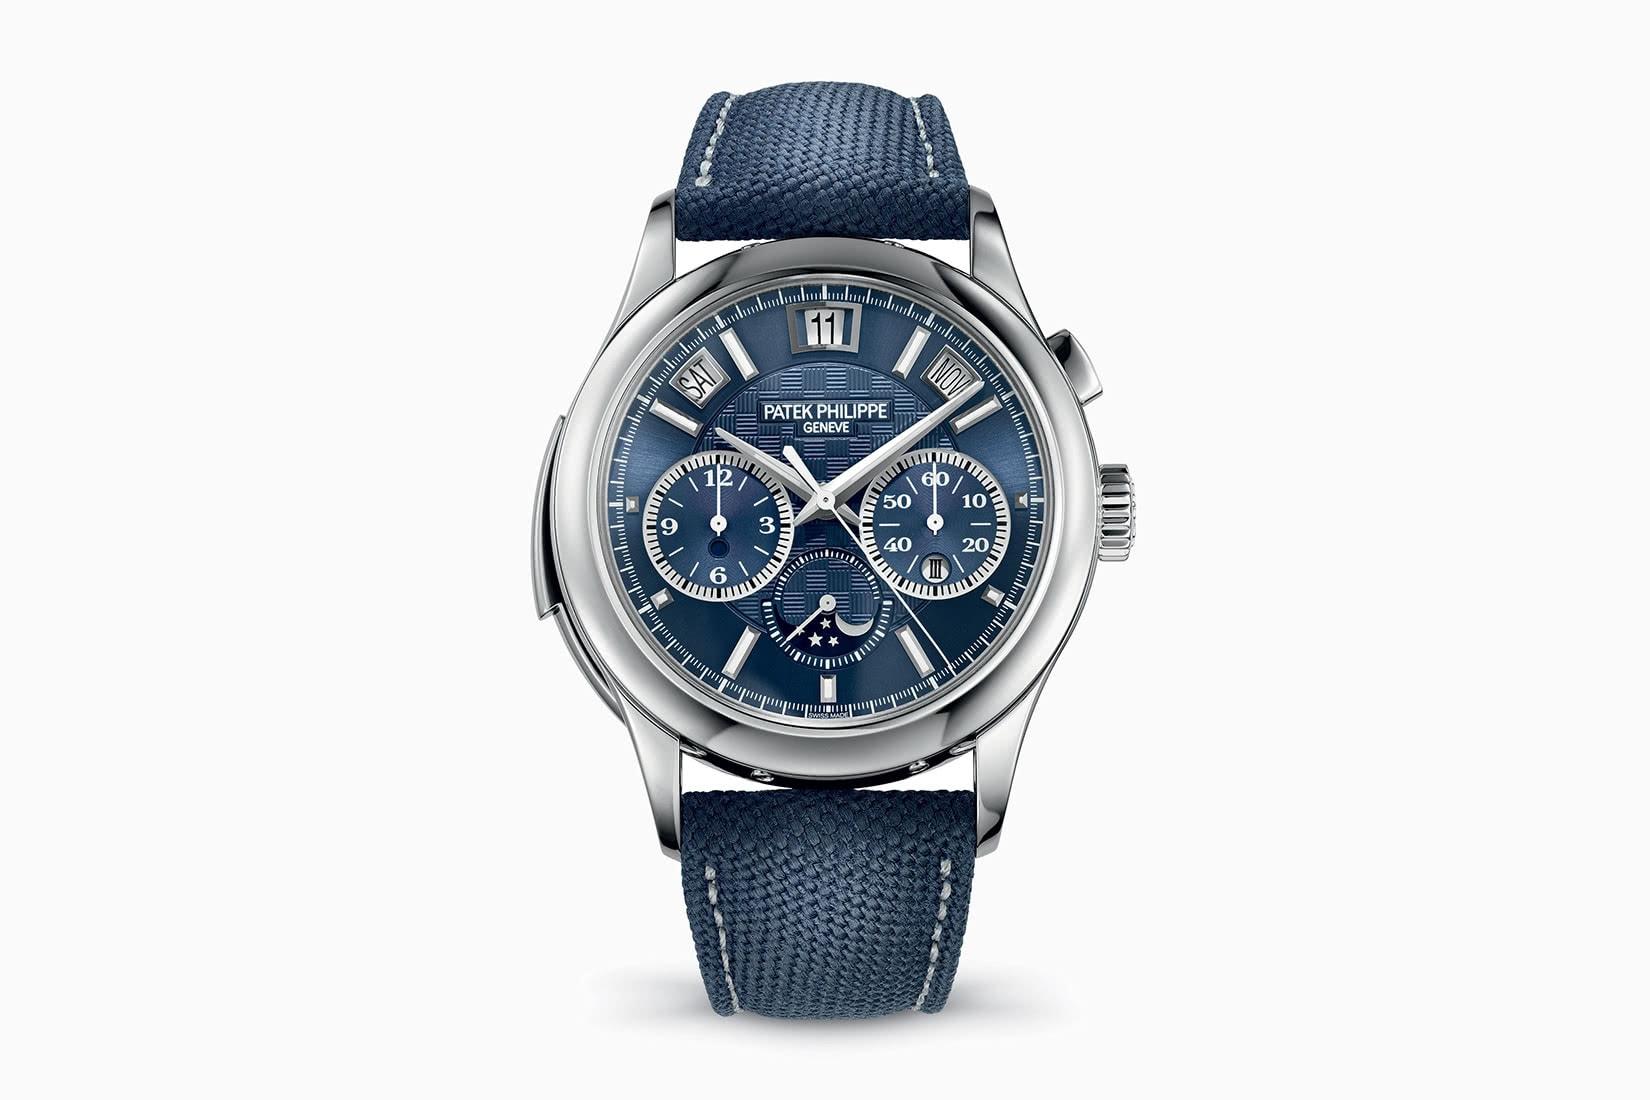 most expensive watches patek philippe titanium ref 5208T 010 - Luxe Digital